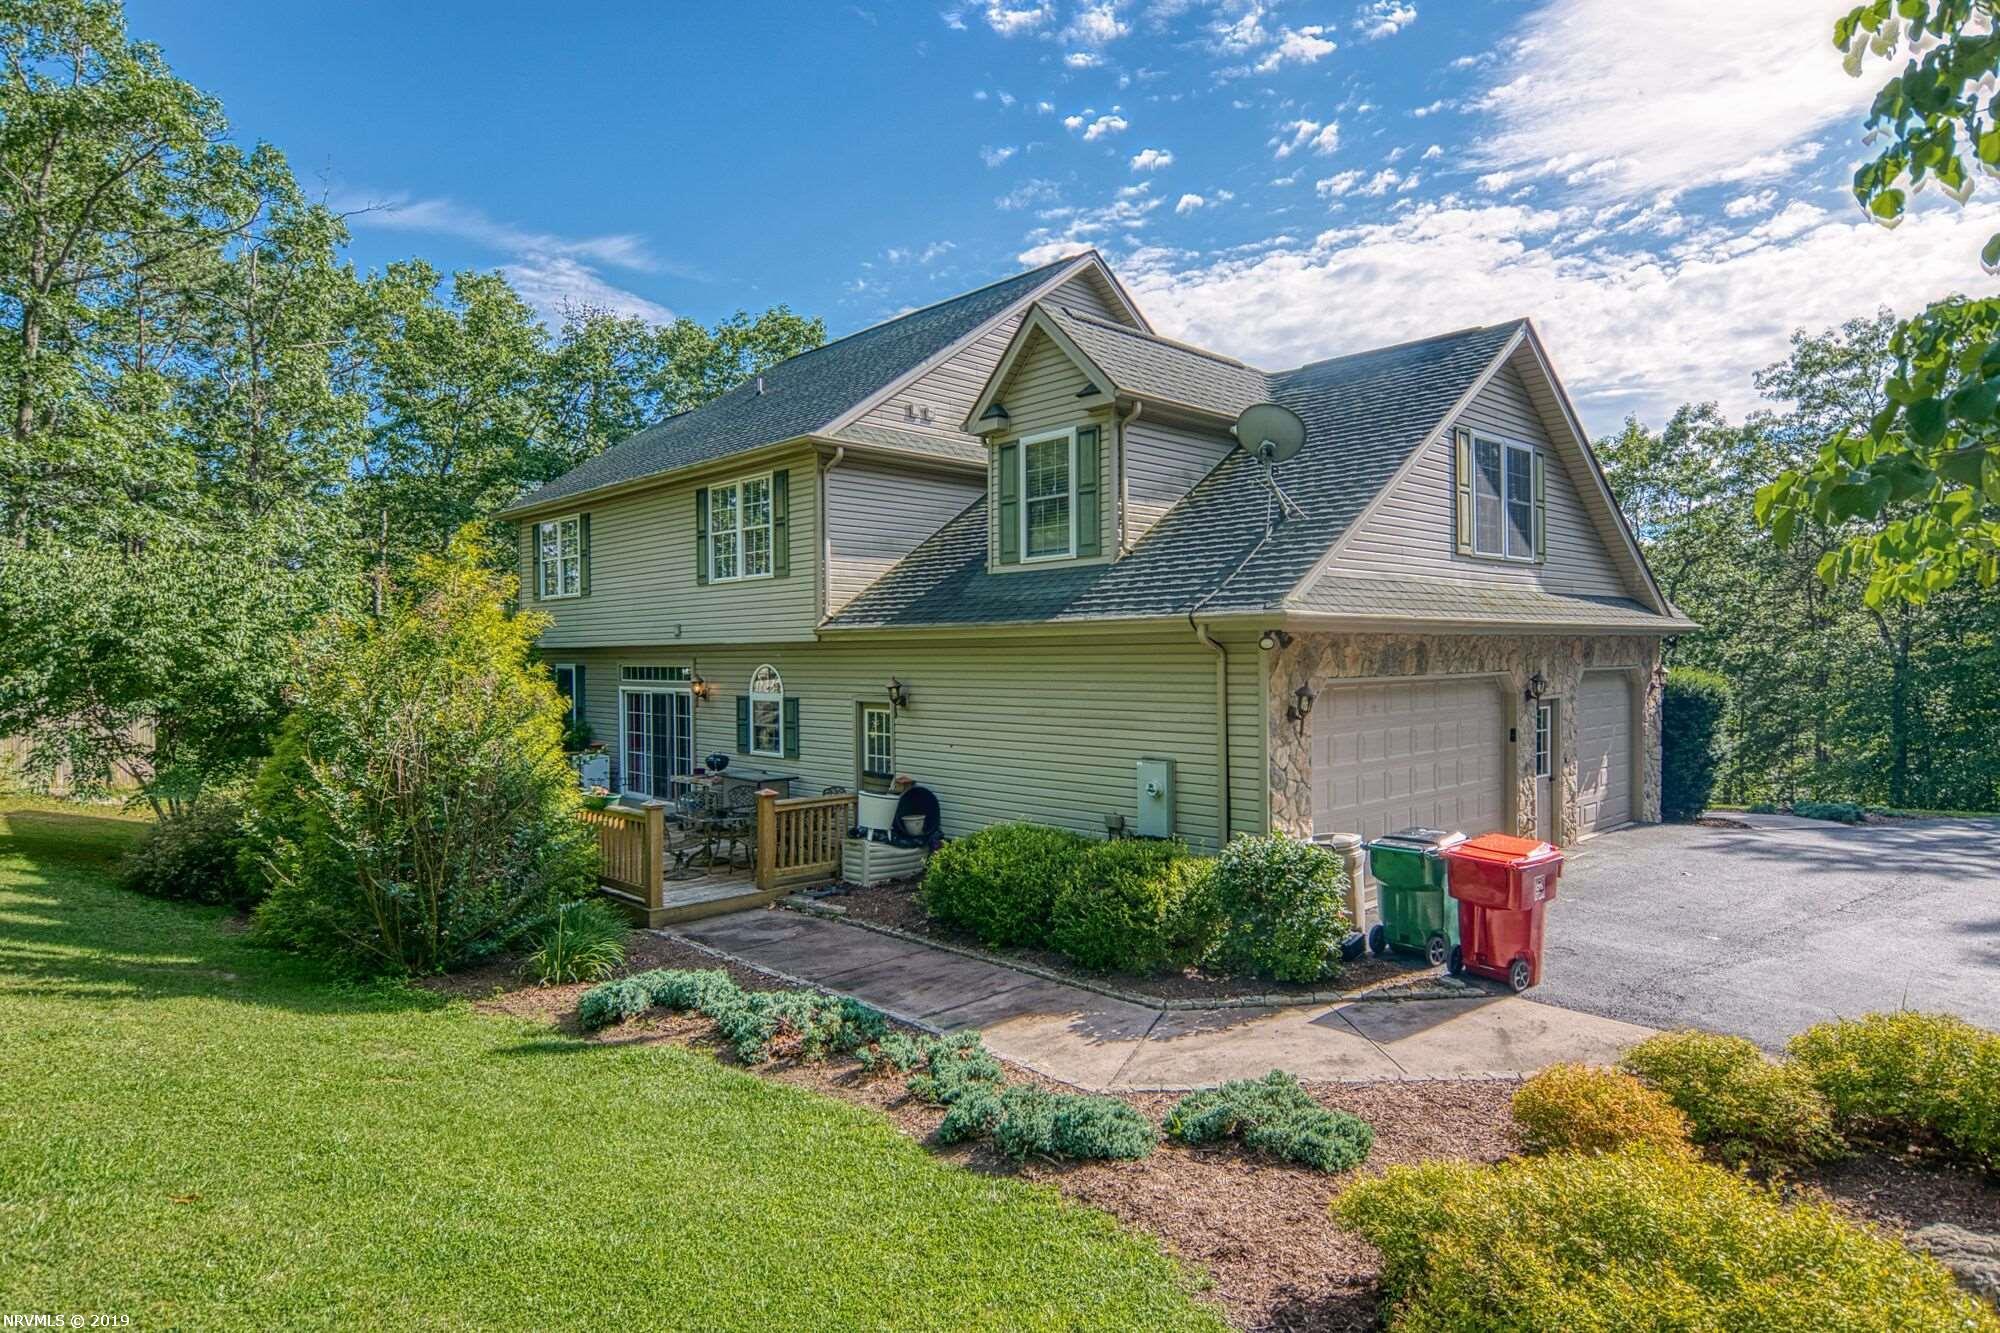 Additional photo for property listing at 590 Brush Mtn Road W Blacksburg, Virginia 24060 United States